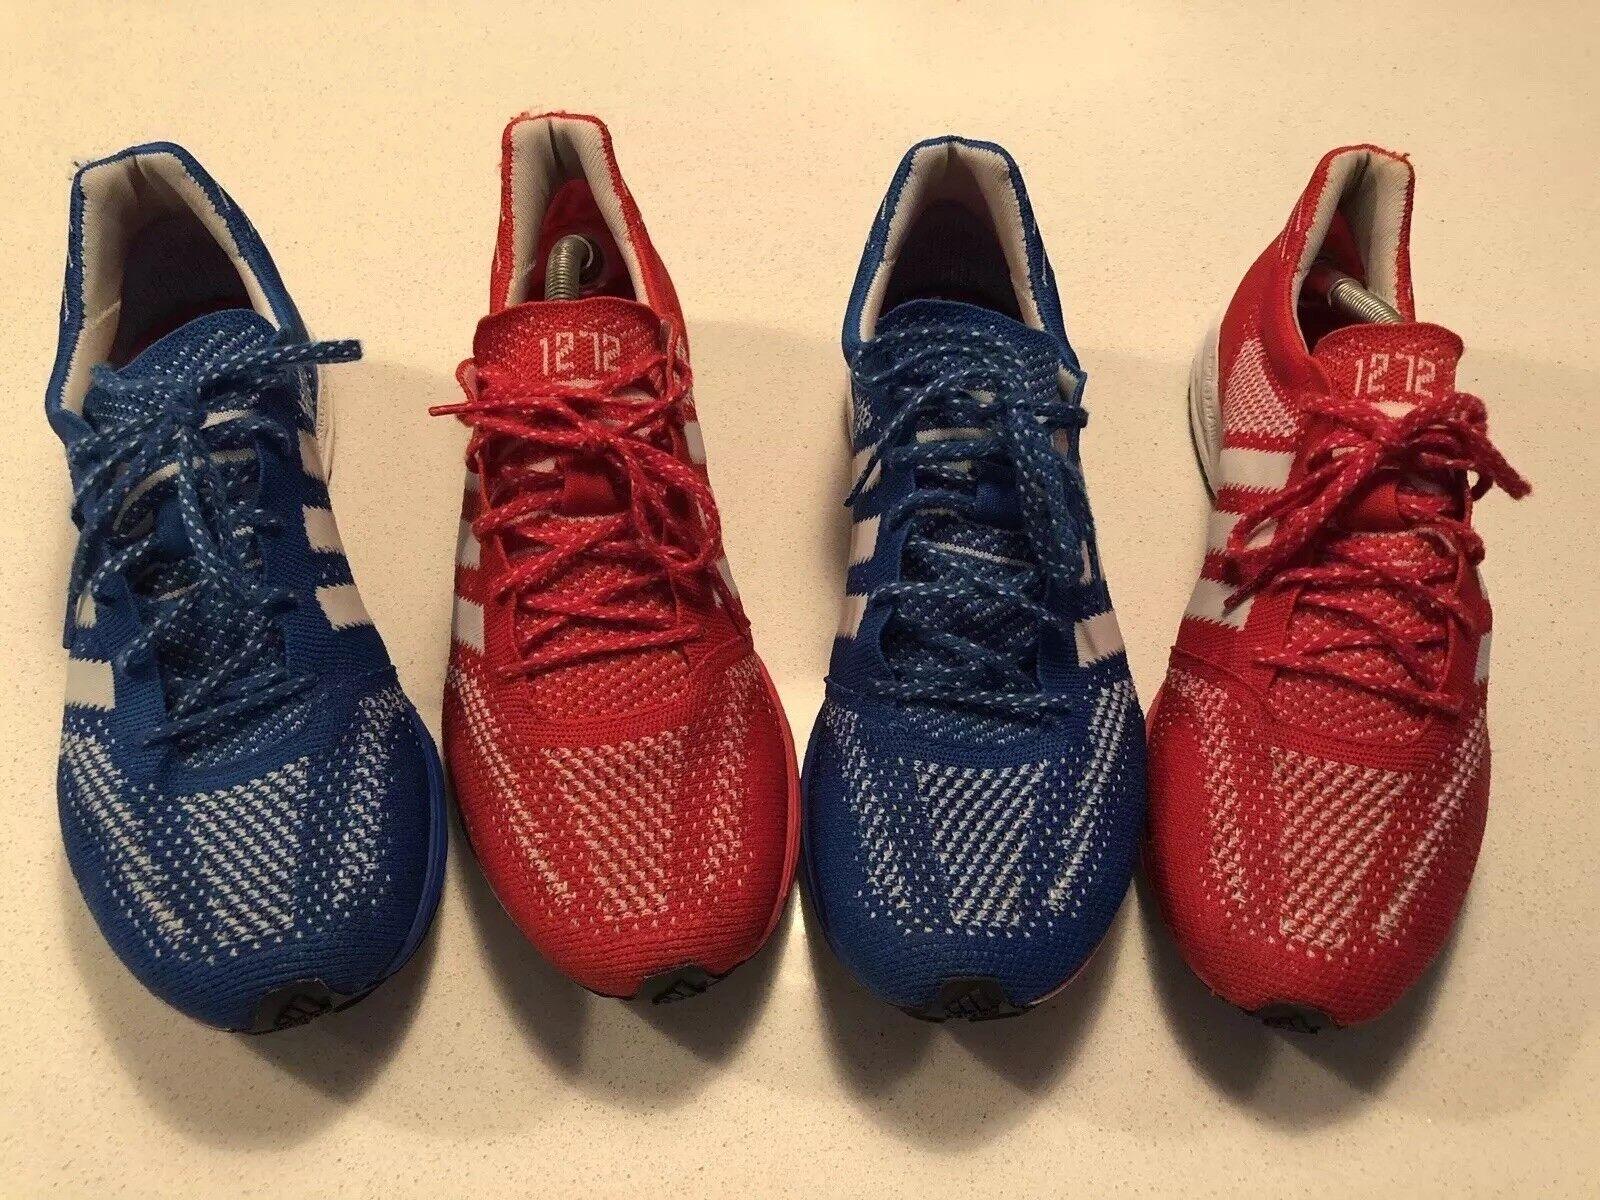 X2 pairs adidas ADIZero PrimeKnit 2012 Olympics TeamGB No.1272 UK7 RARE Boost